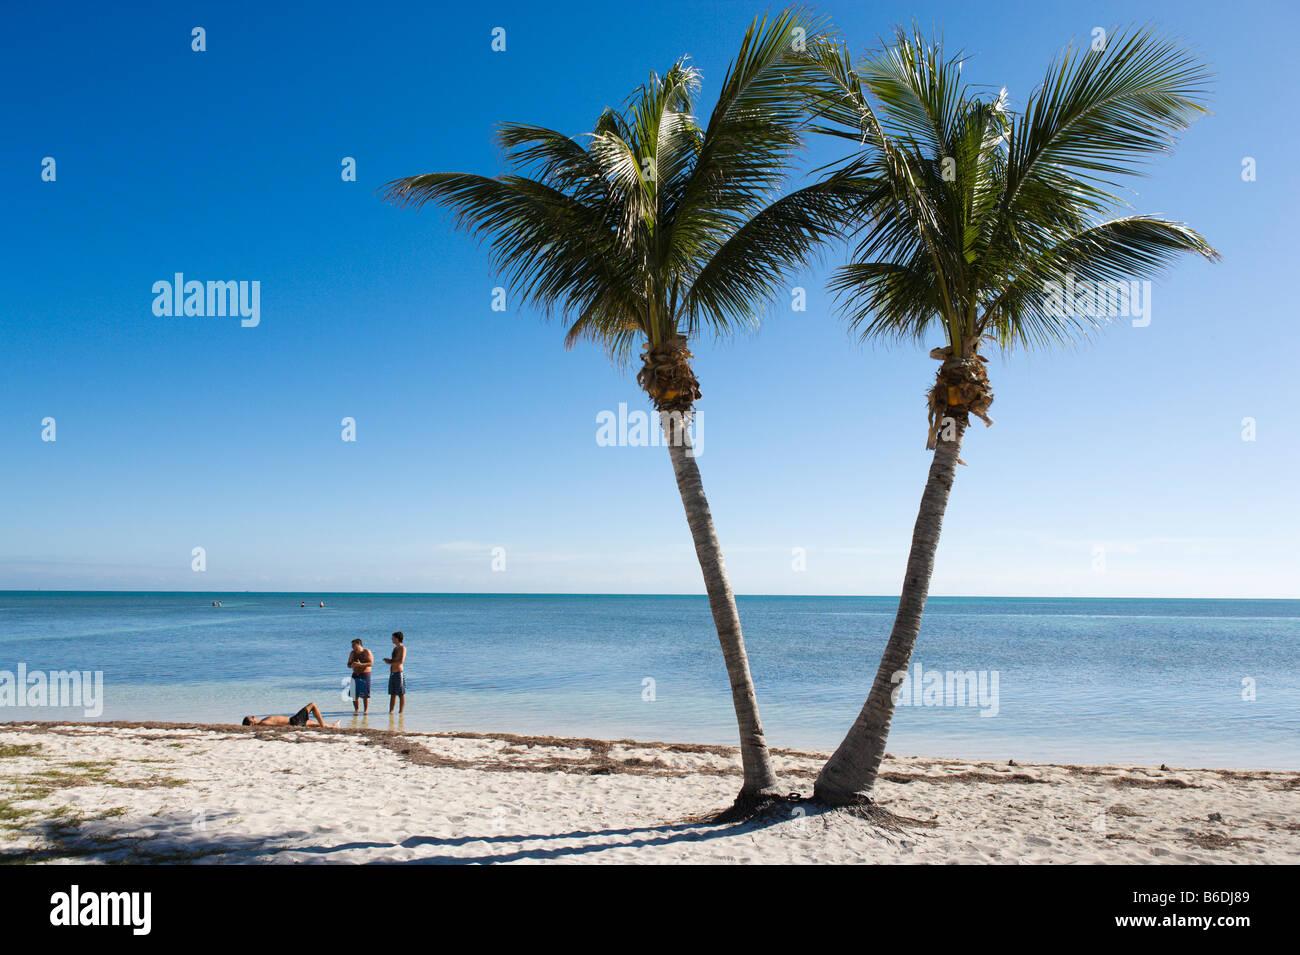 Veterans Beach Stockfotos & Veterans Beach Bilder - Alamy